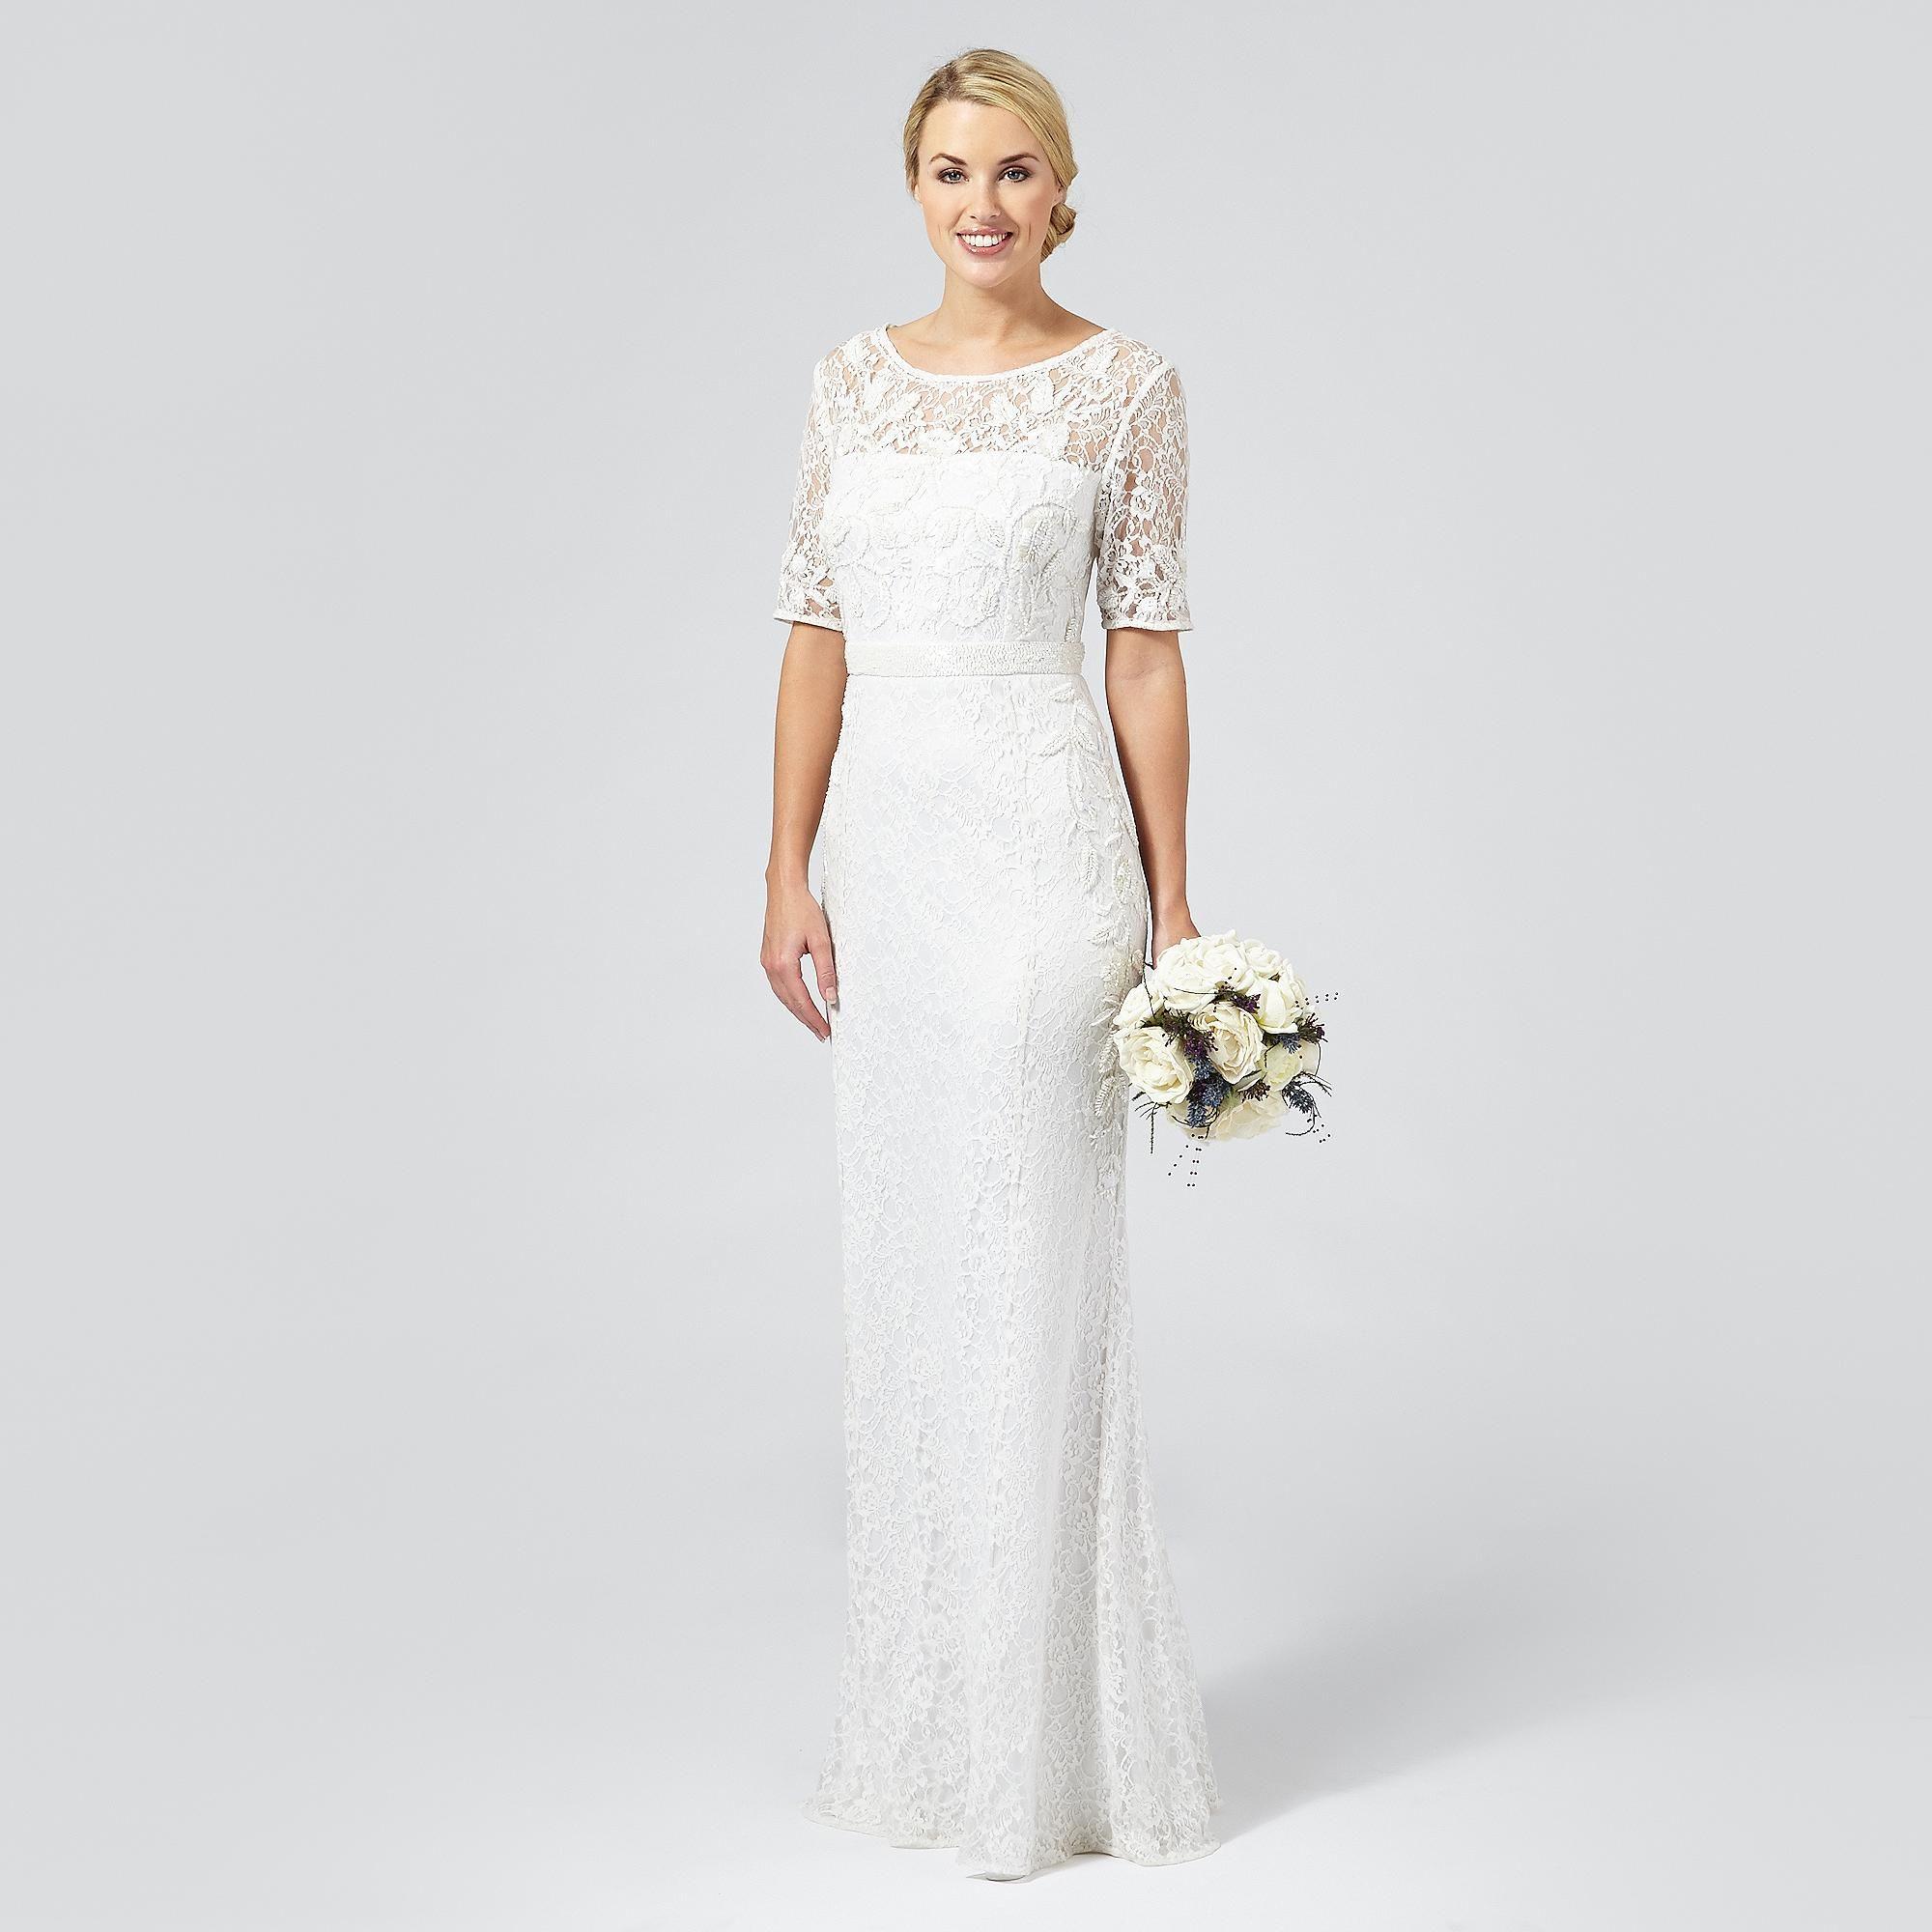 Ivory \'Paloma\' lace and beaded wedding dress - Women - Debenhams ...